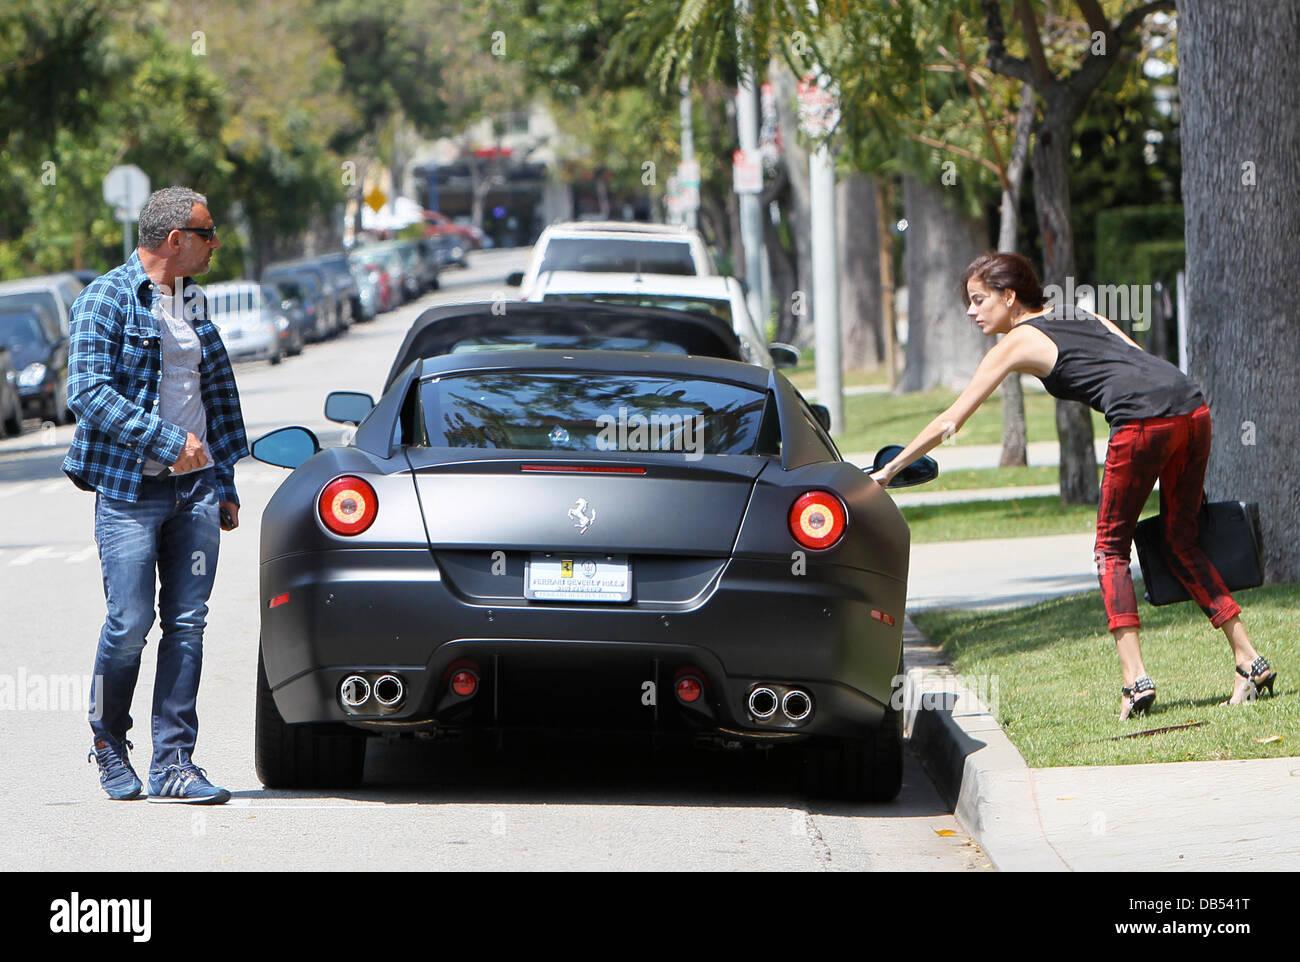 christian audigier and his girlfriend nathalie sorensen drive his matte black ferrari 599 gtb to look - Matte Black Ferrari 599